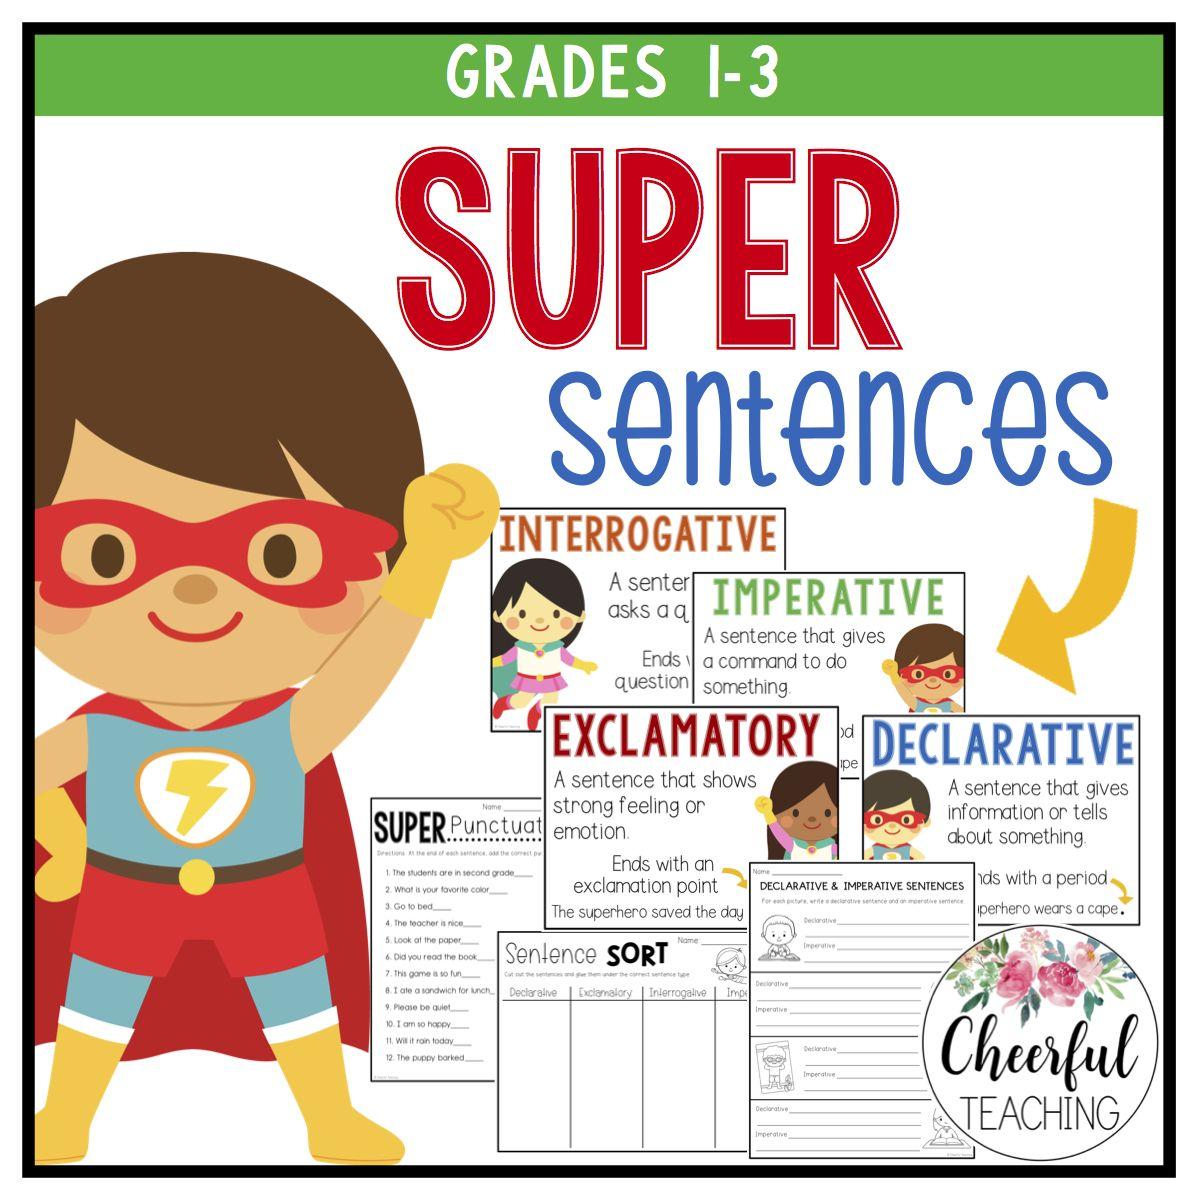 Super Sentences Declarative Interrogative Exclamatory